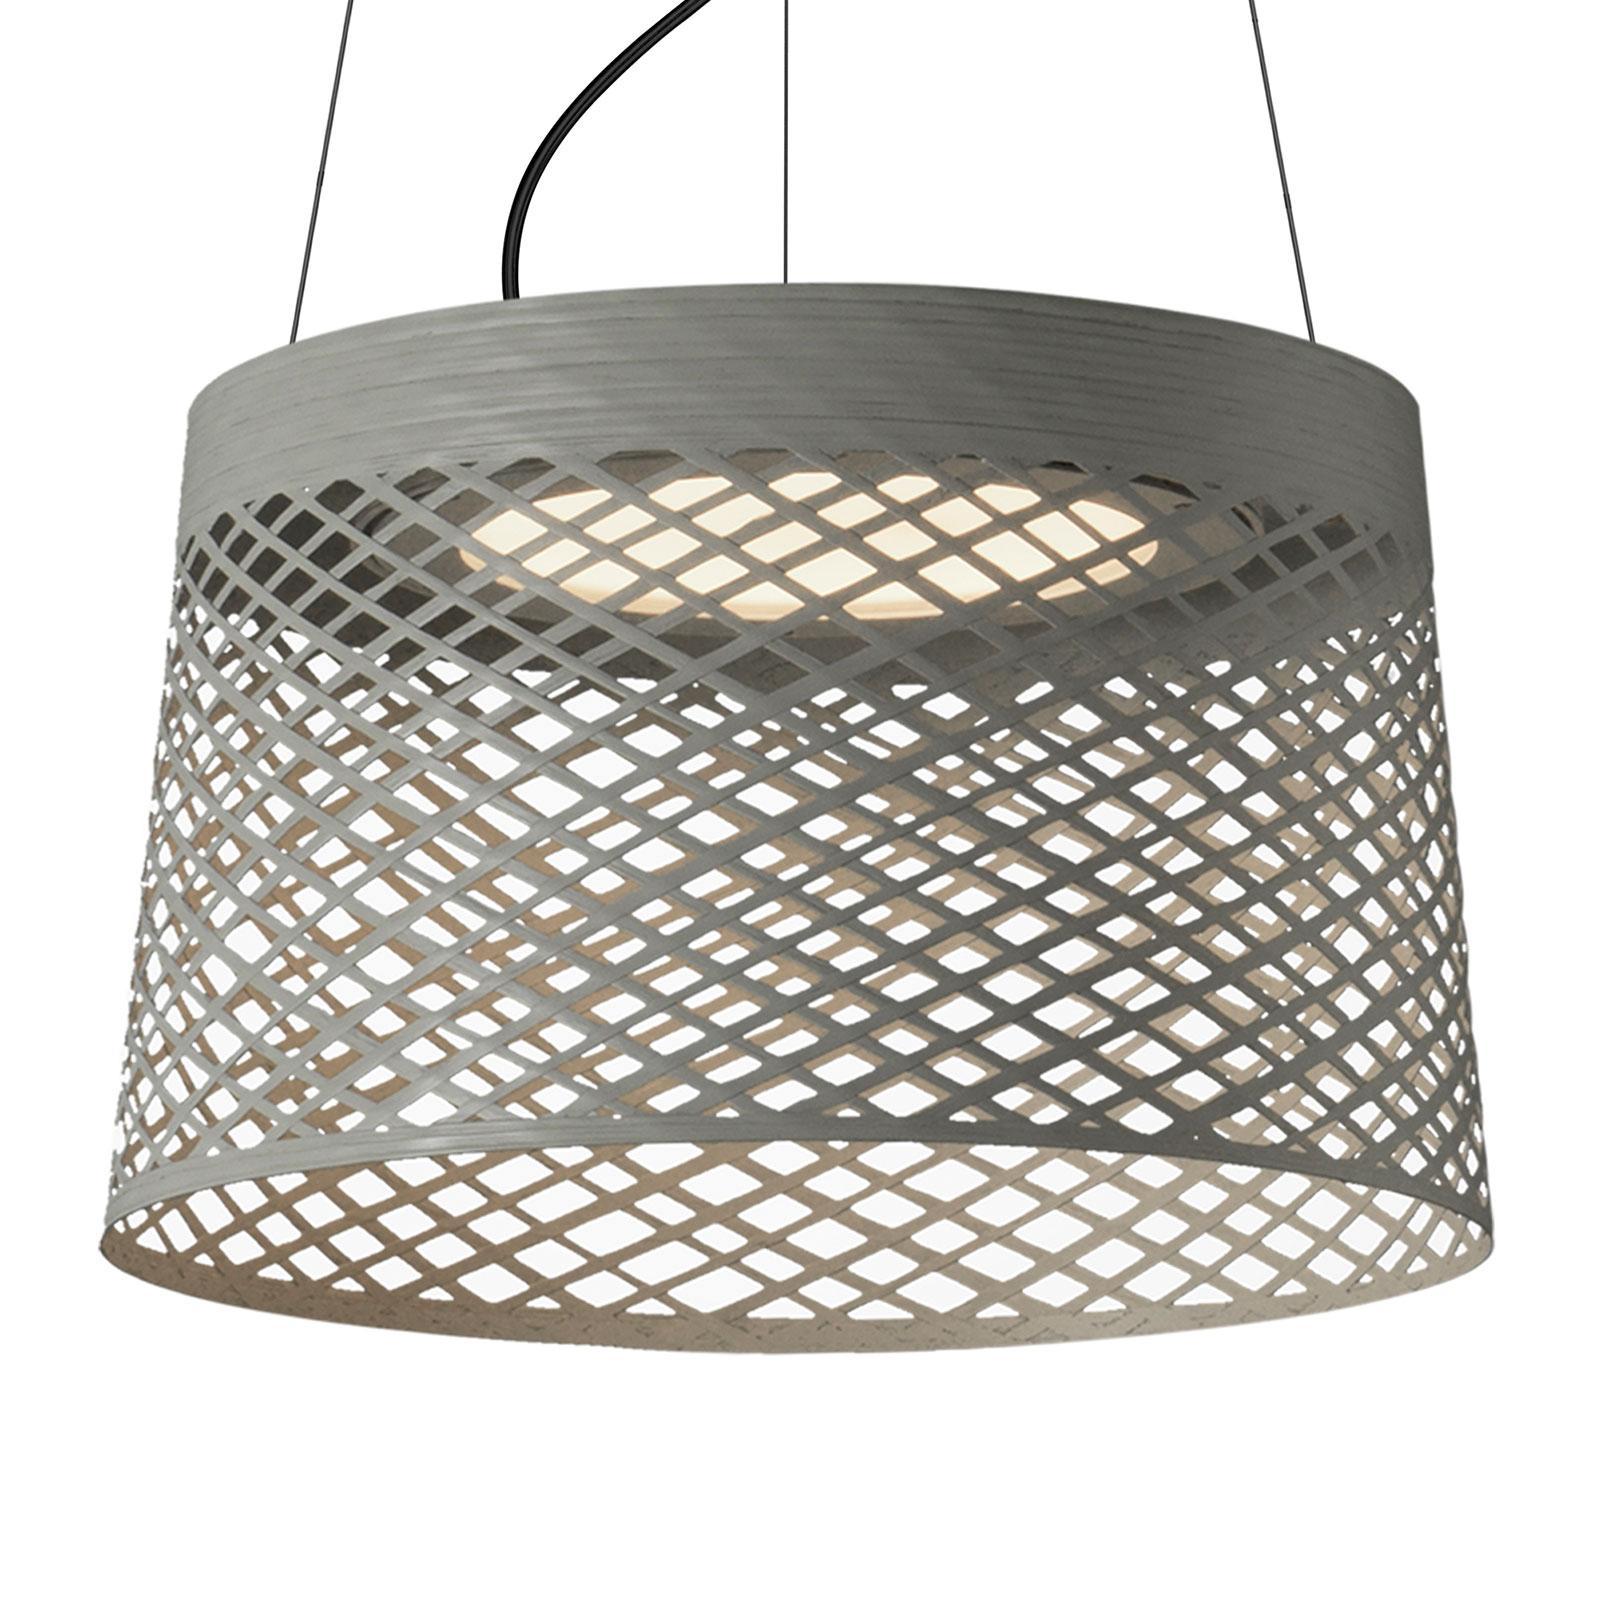 Foscarini Twiggy Grid LED -riippuvalaisin, greige